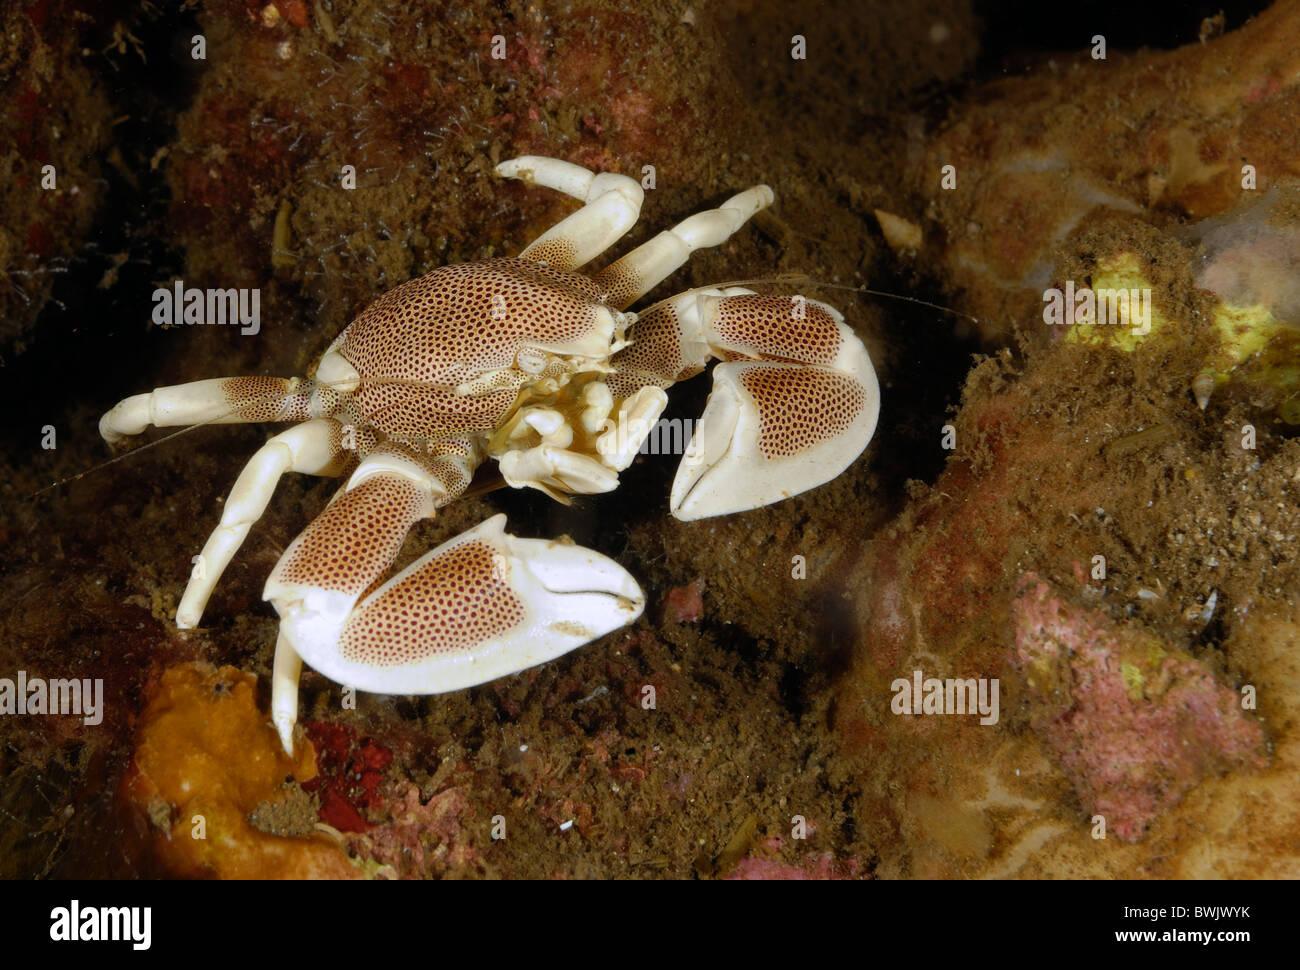 Porcelain crab or Anemone Crabs Neopetrolisthes ohshimai, Porcellanidae, Tulamben, Bali,. Indonesia, Asia - Stock Image